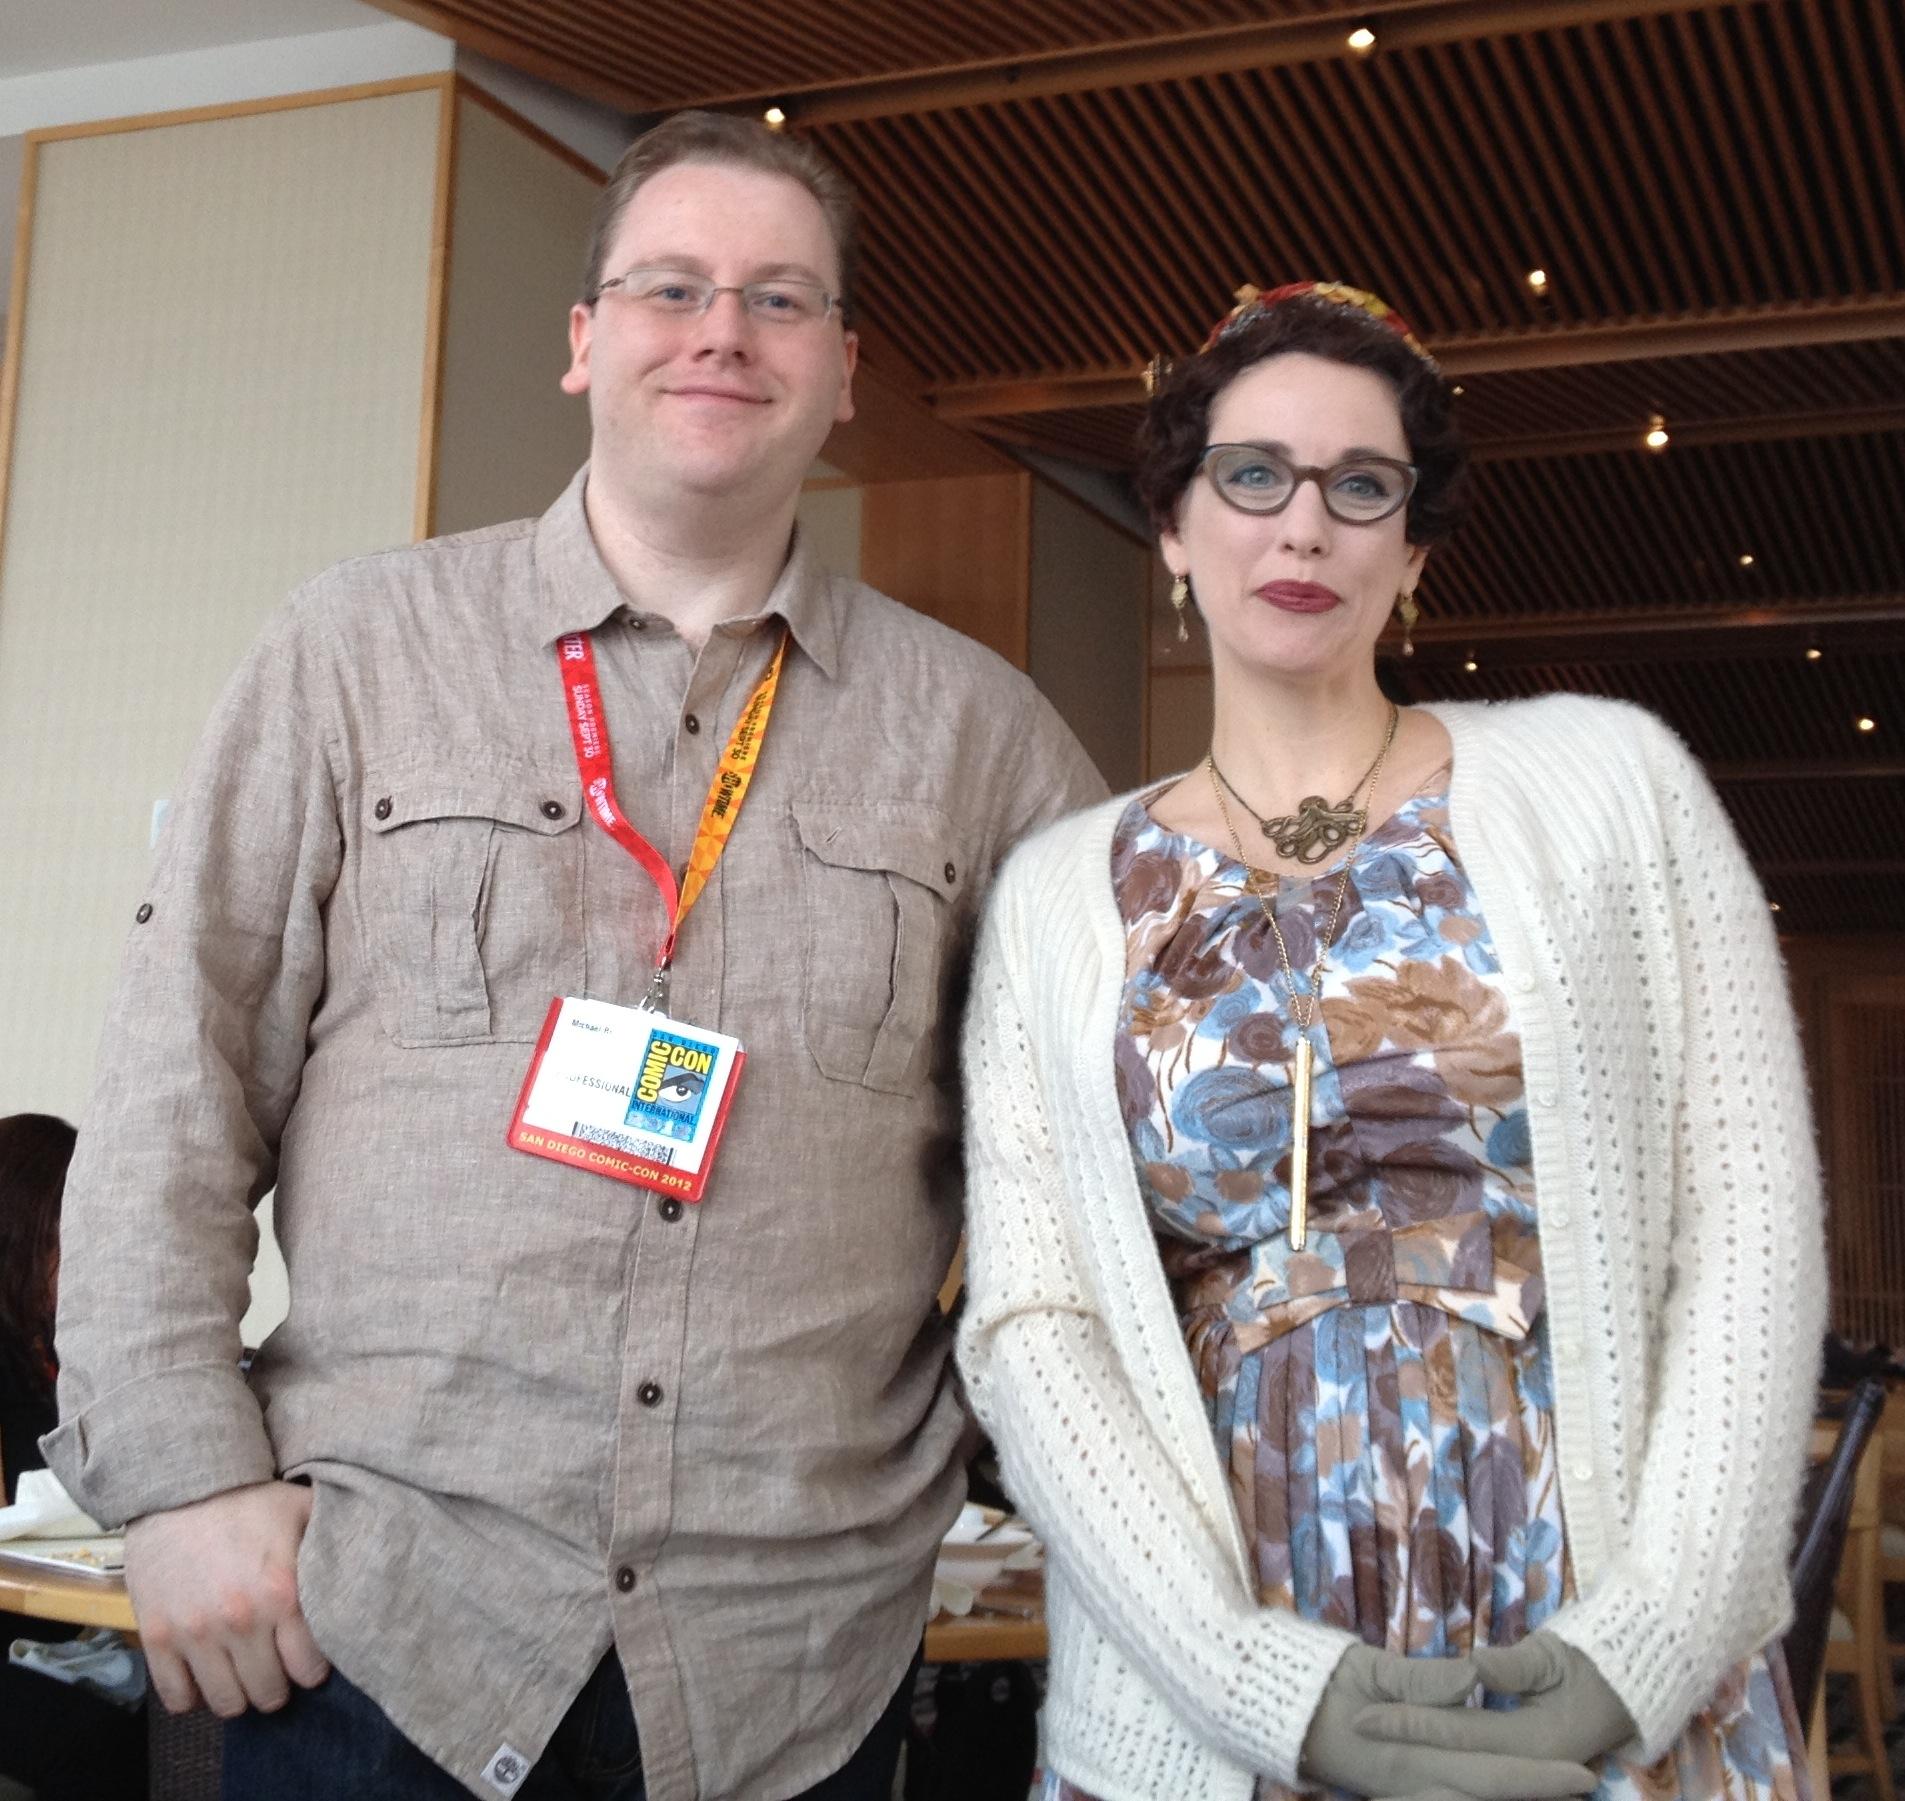 Michael & Gail